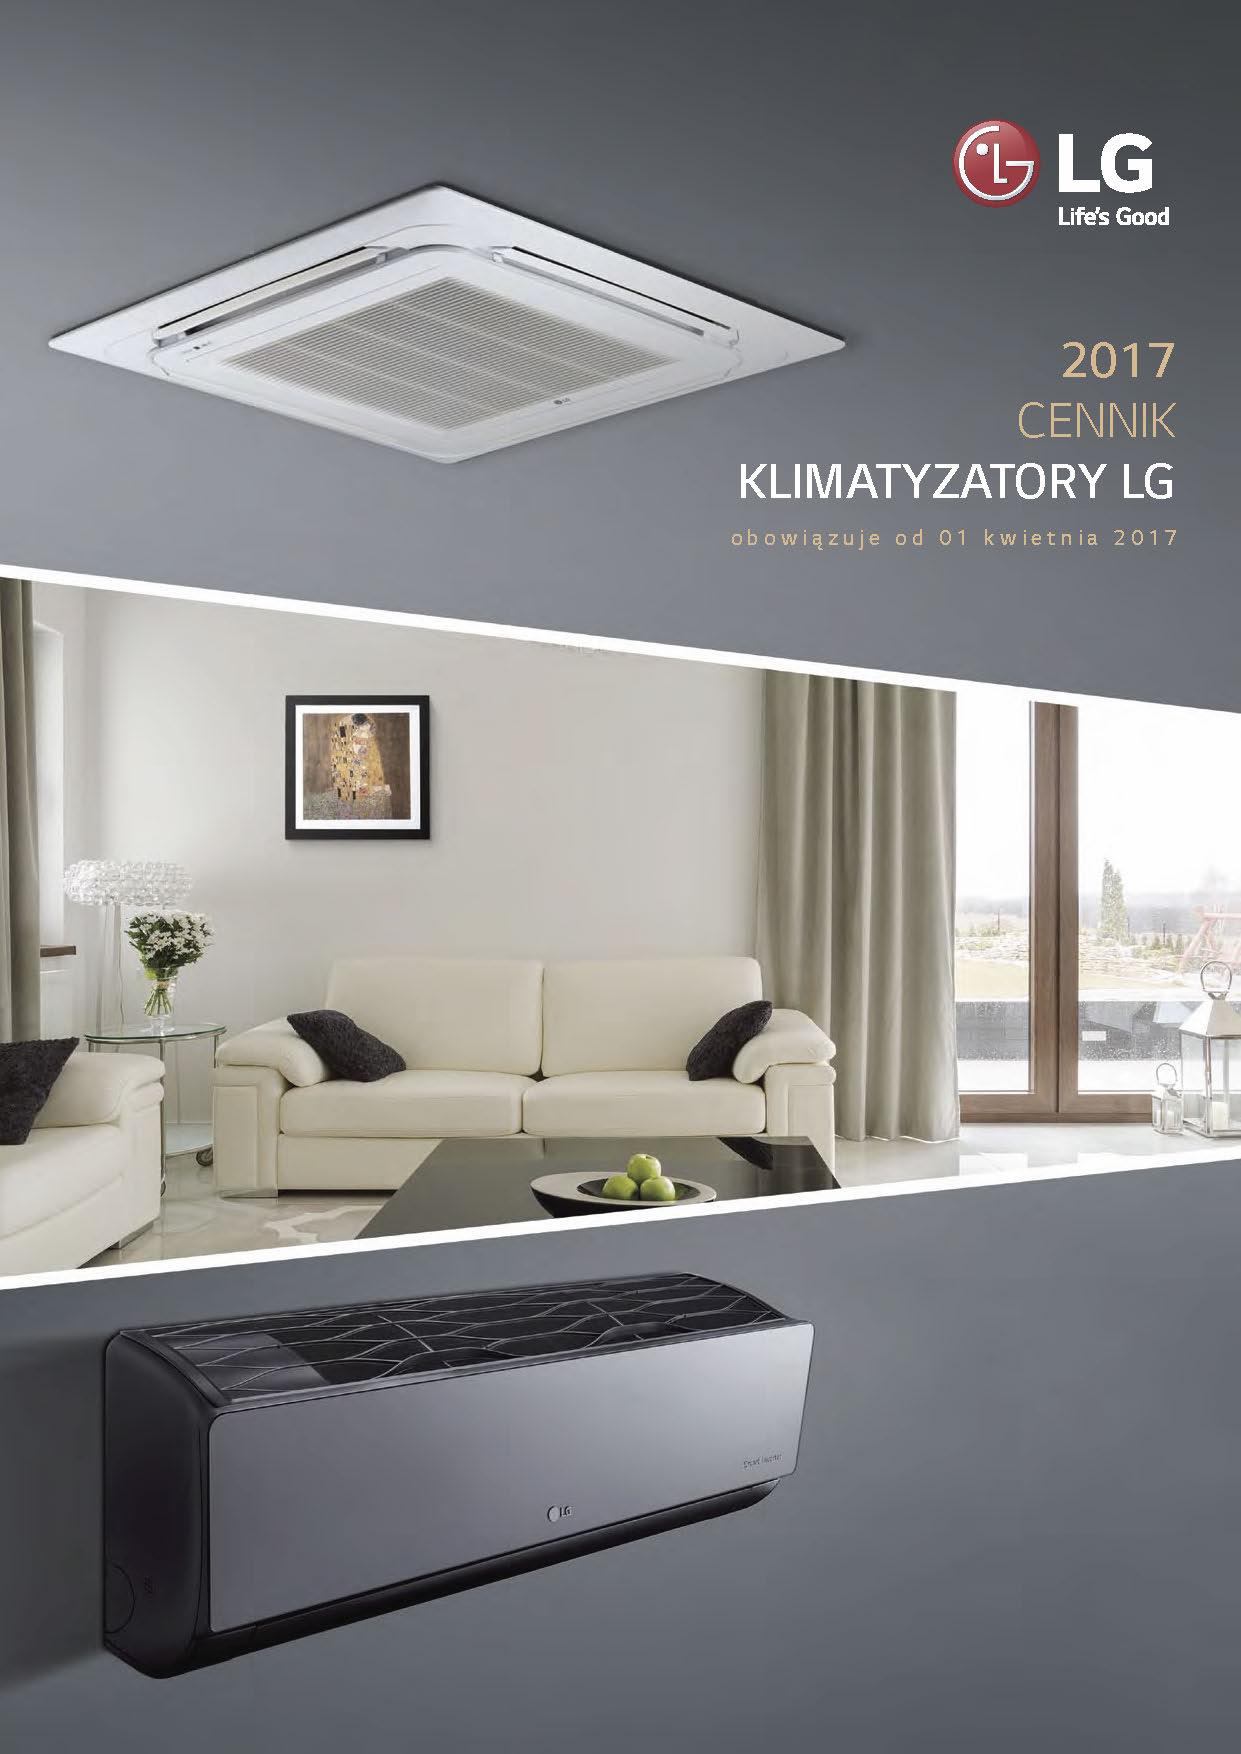 NOWY cennik LG 2017